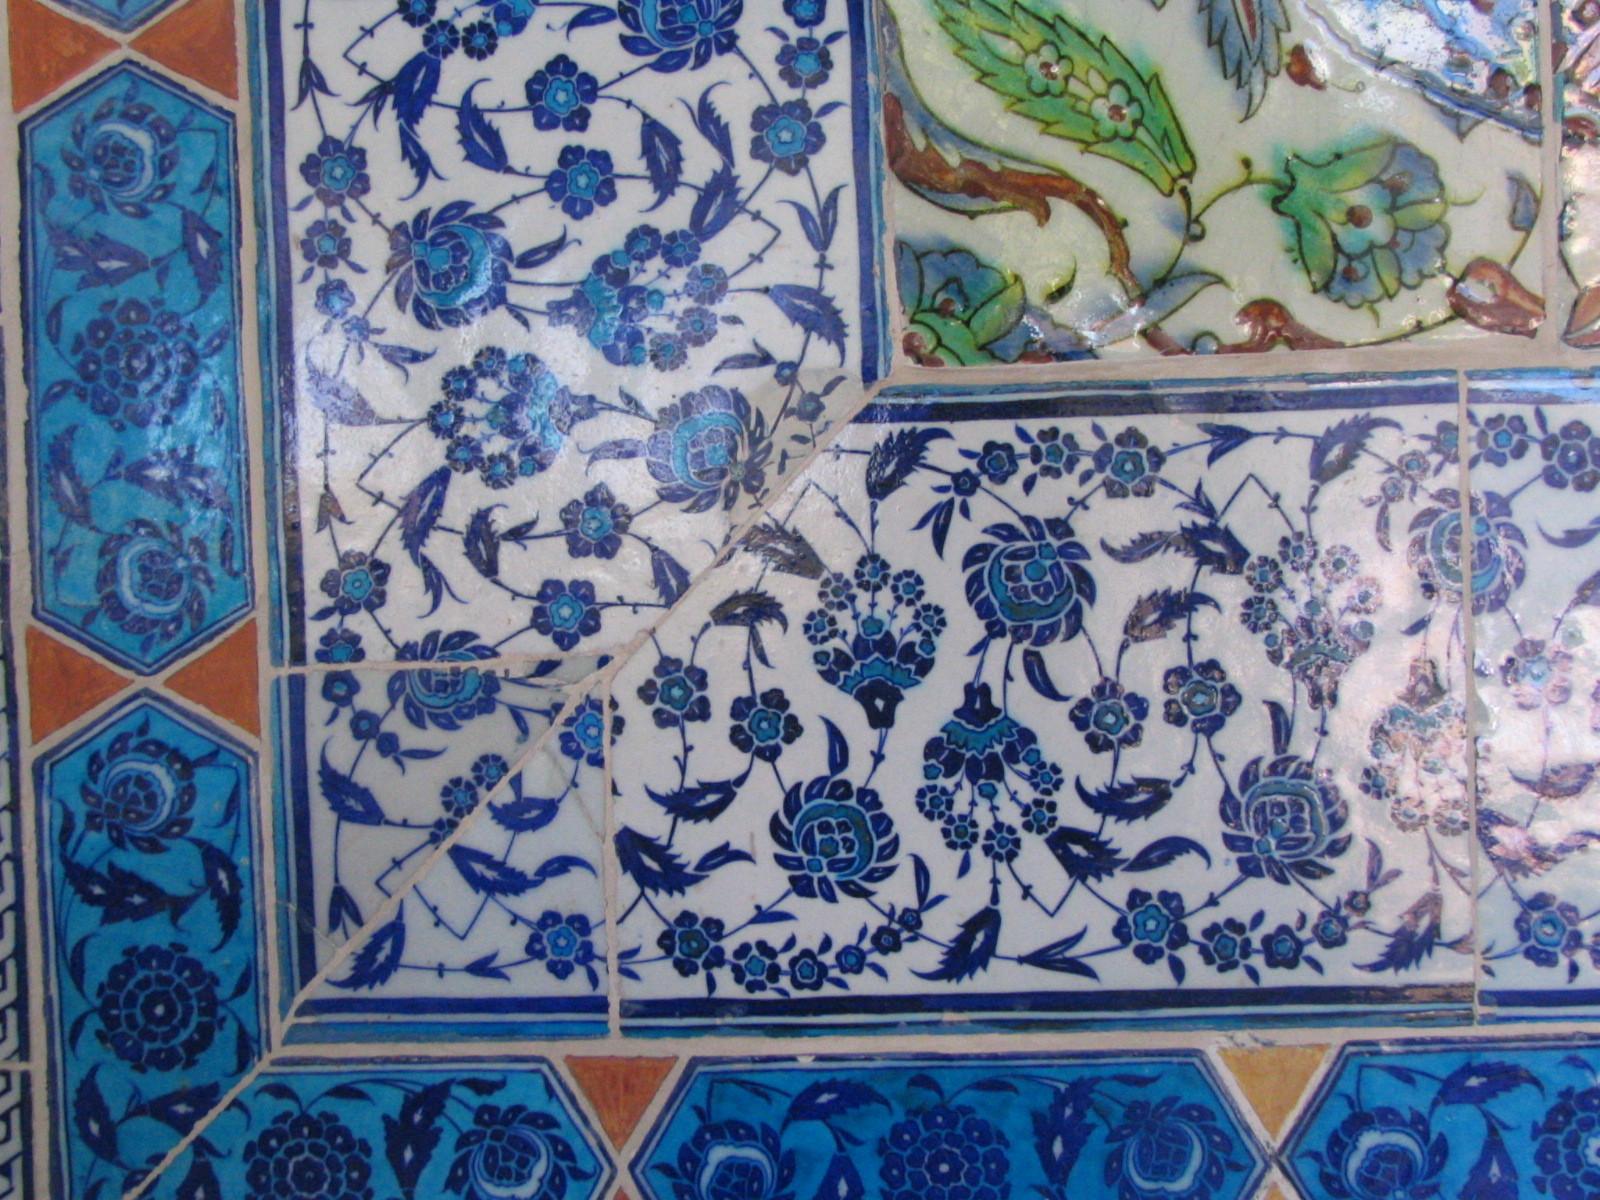 turkish-hospitality-how-everyone-is-fami